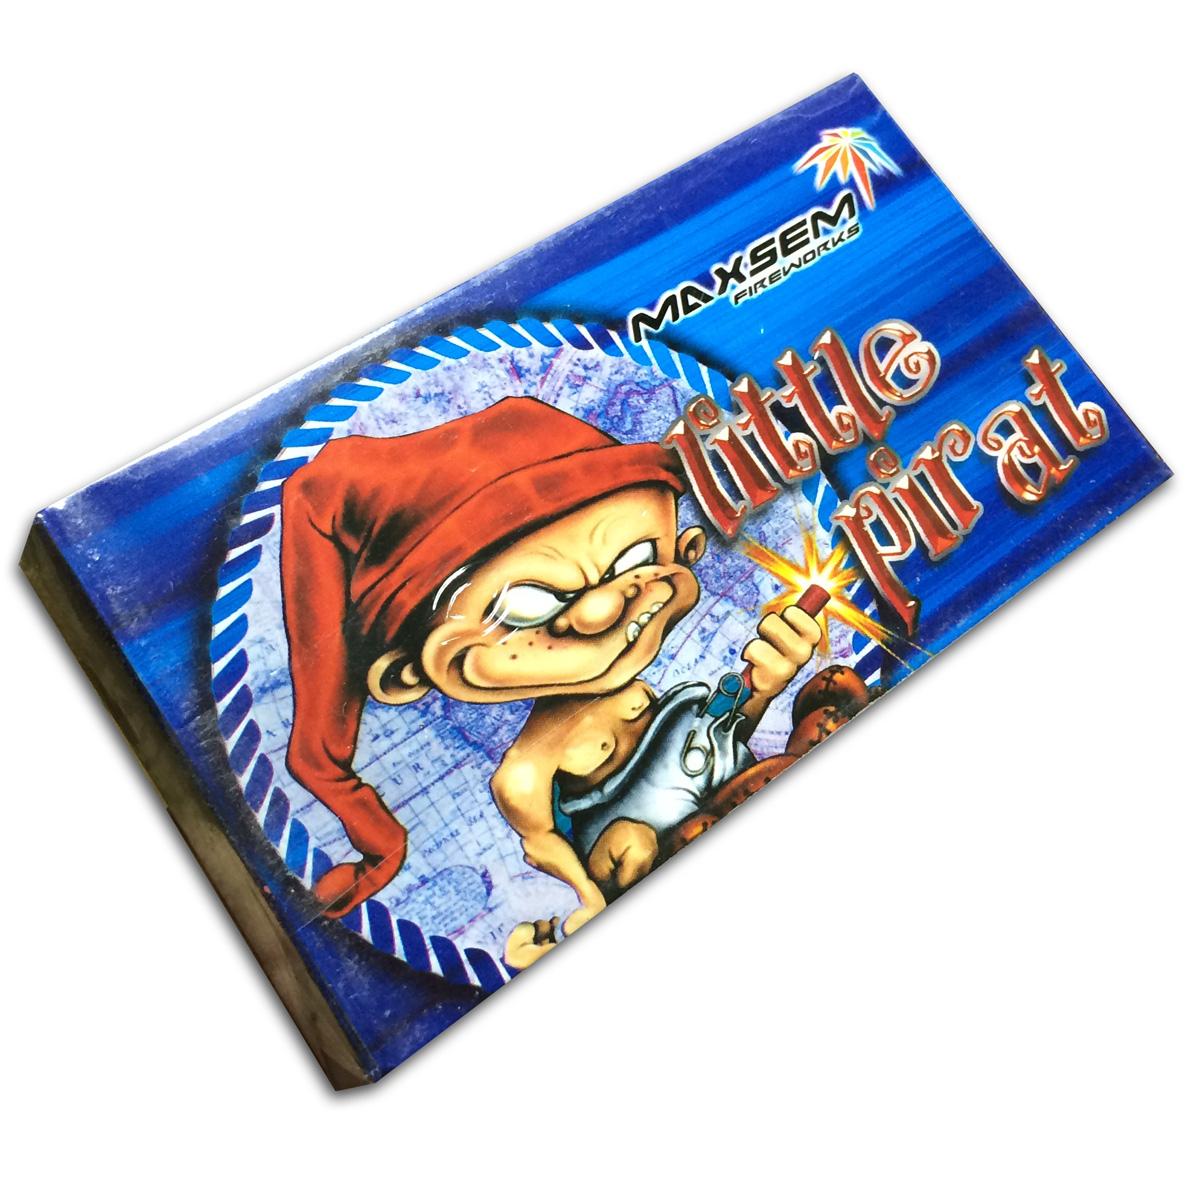 "Петарда терочная ""Little Pirat"" 0203/2 (3корсар, 2 хлопка) (50 петард) 1/100"